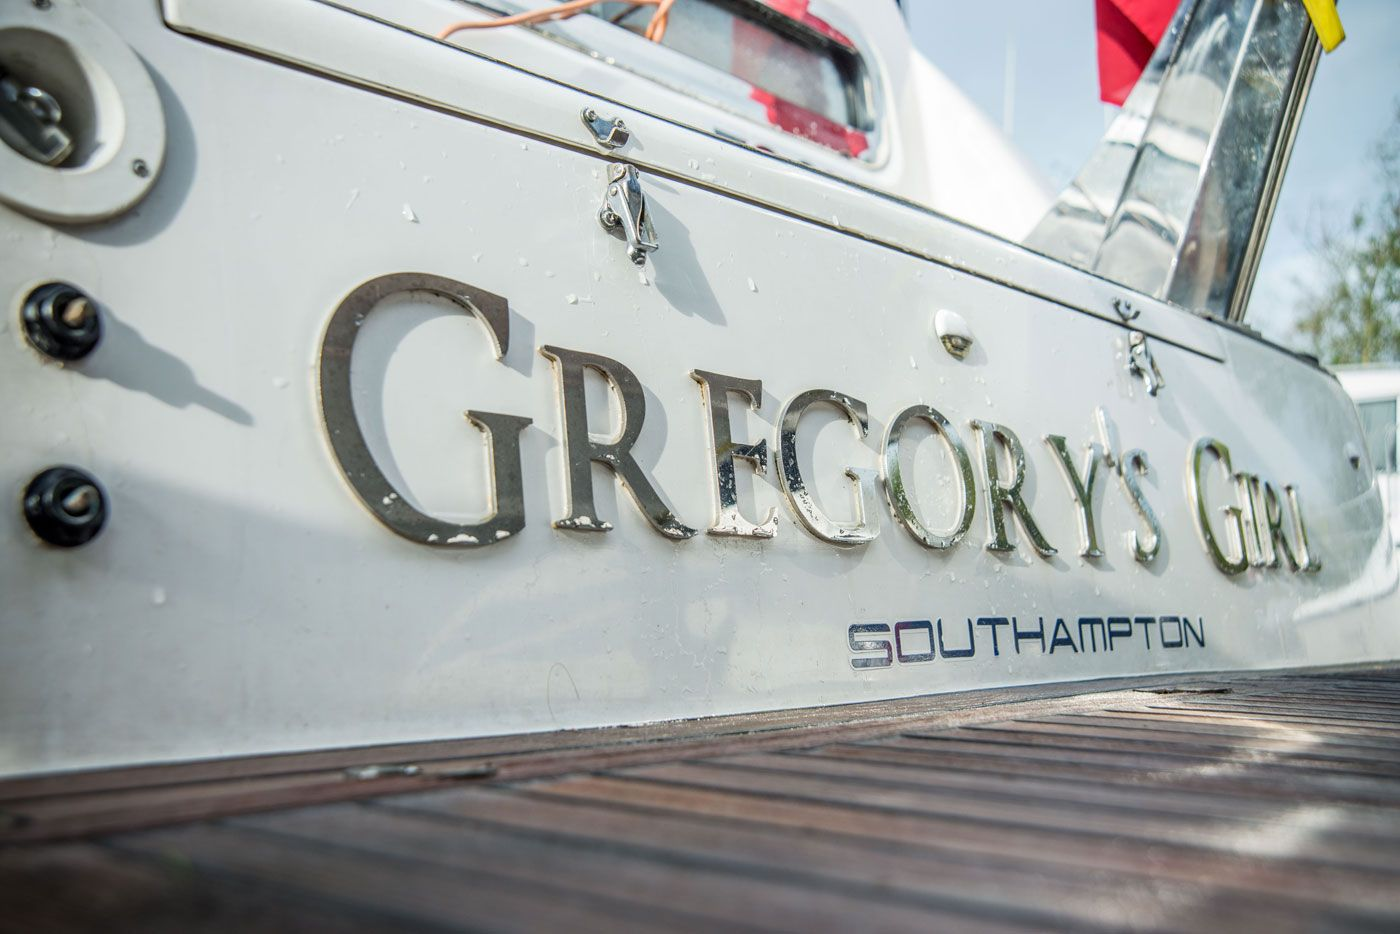 SFP-Gregory's-Girl-A-6